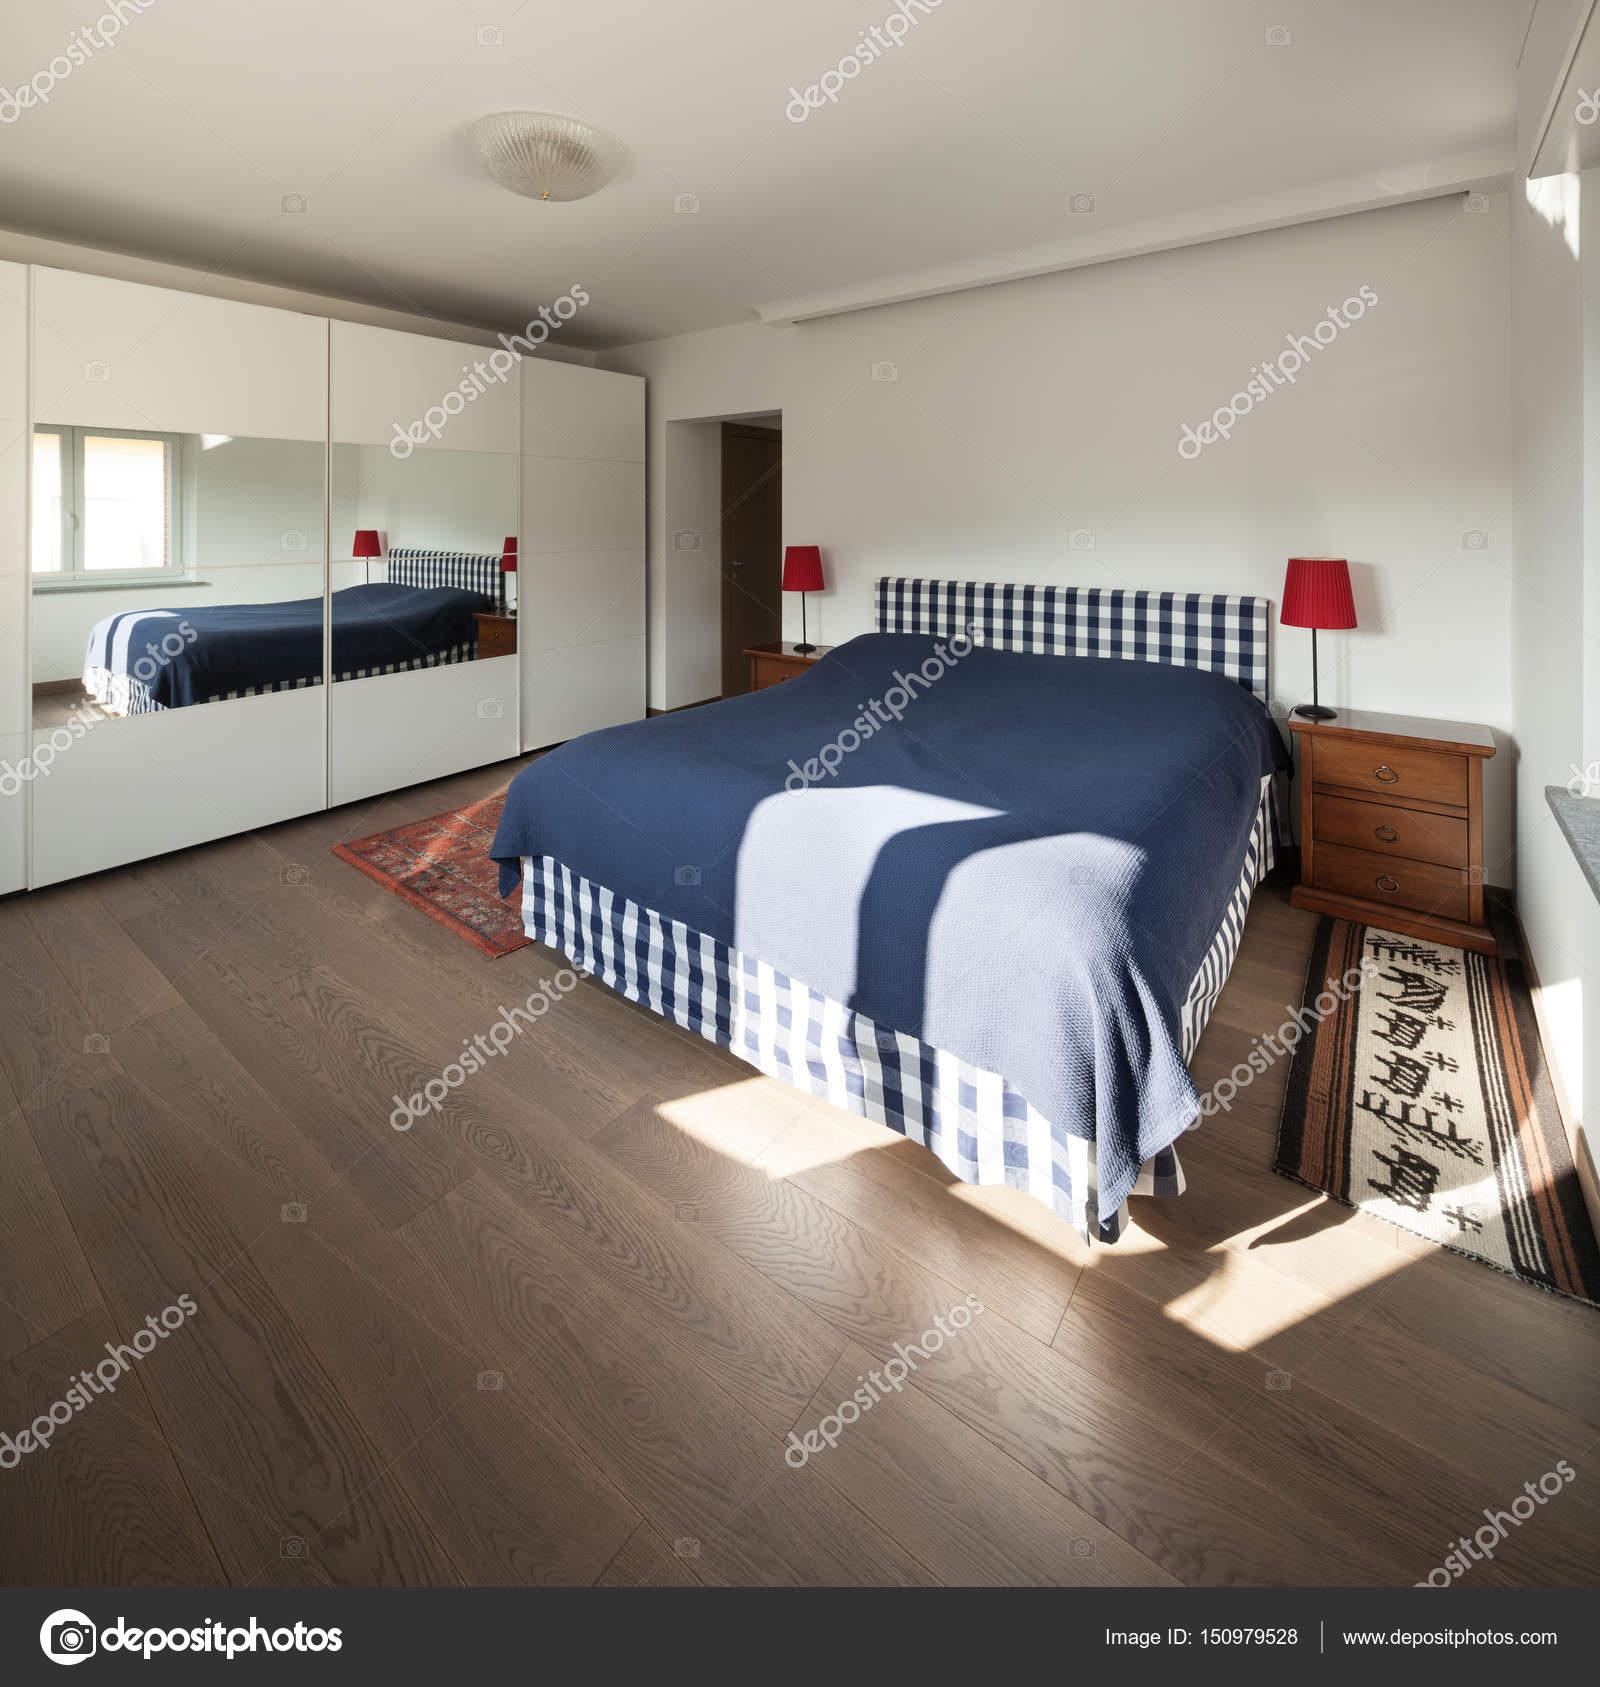 Slaapkamer met houten vloer — Stockfoto © Zveiger #150979528